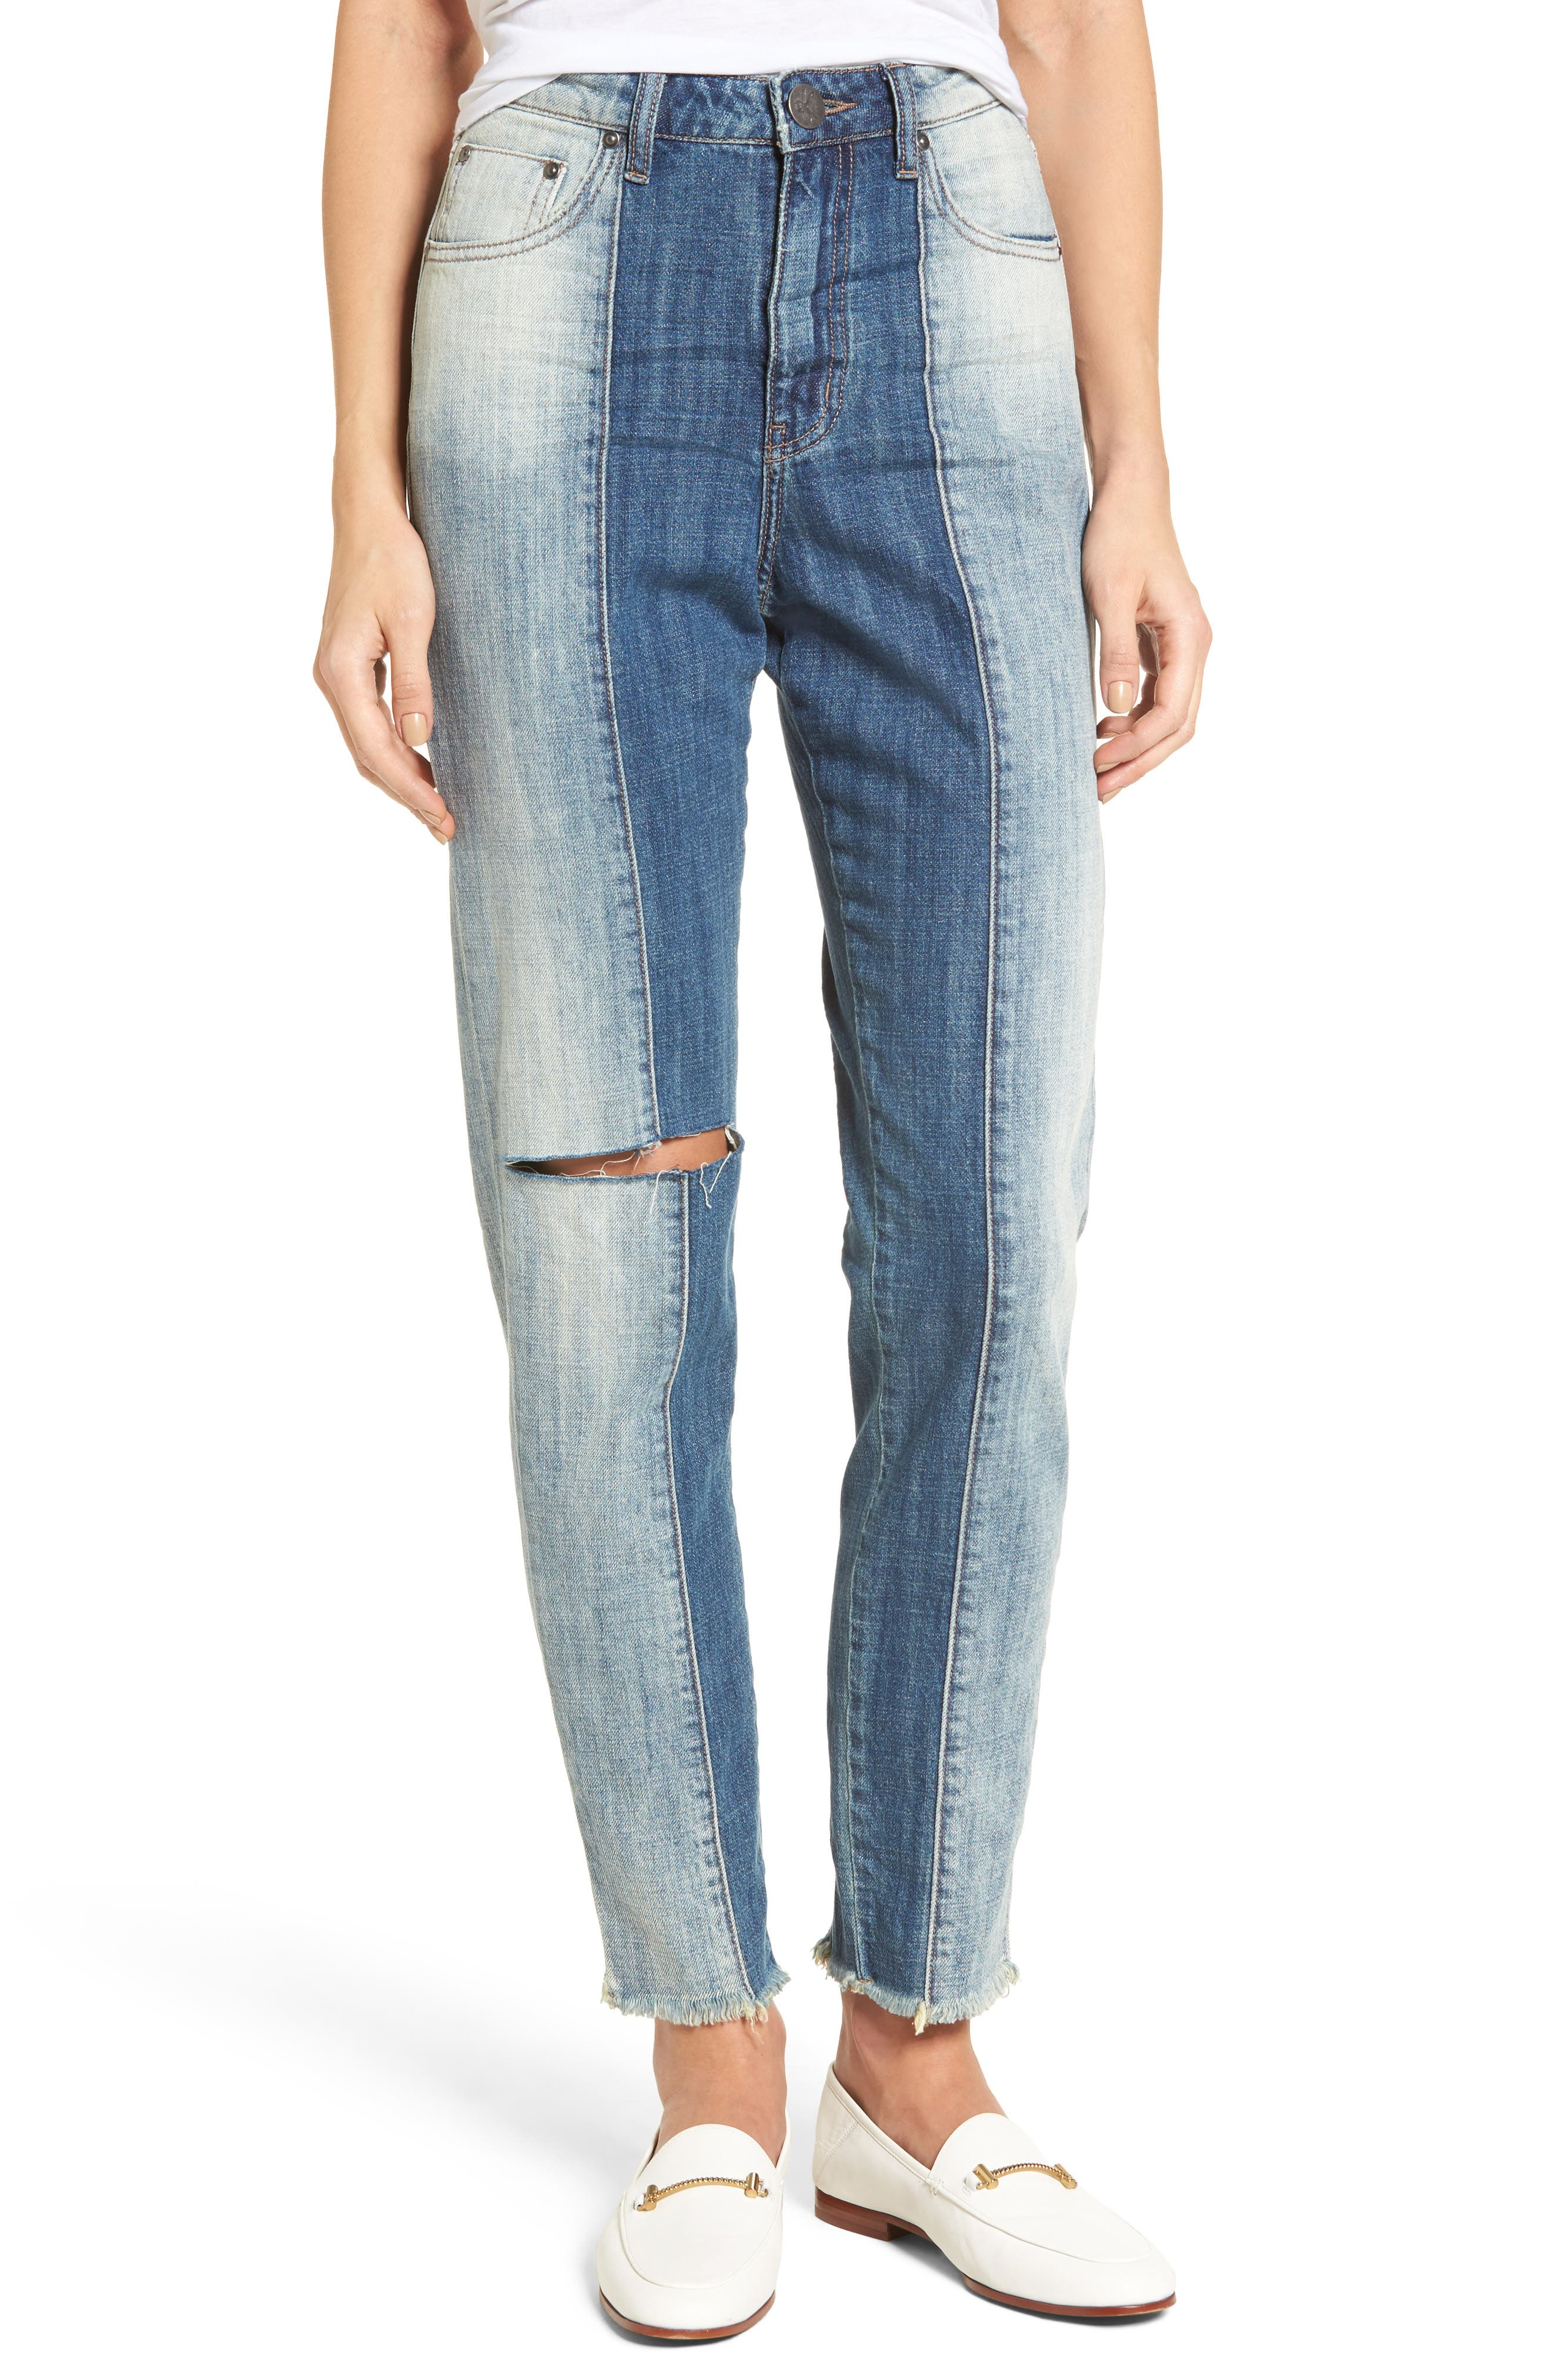 Legend High Waist Mom Jeans,                         Main,                         color, Blue Jack